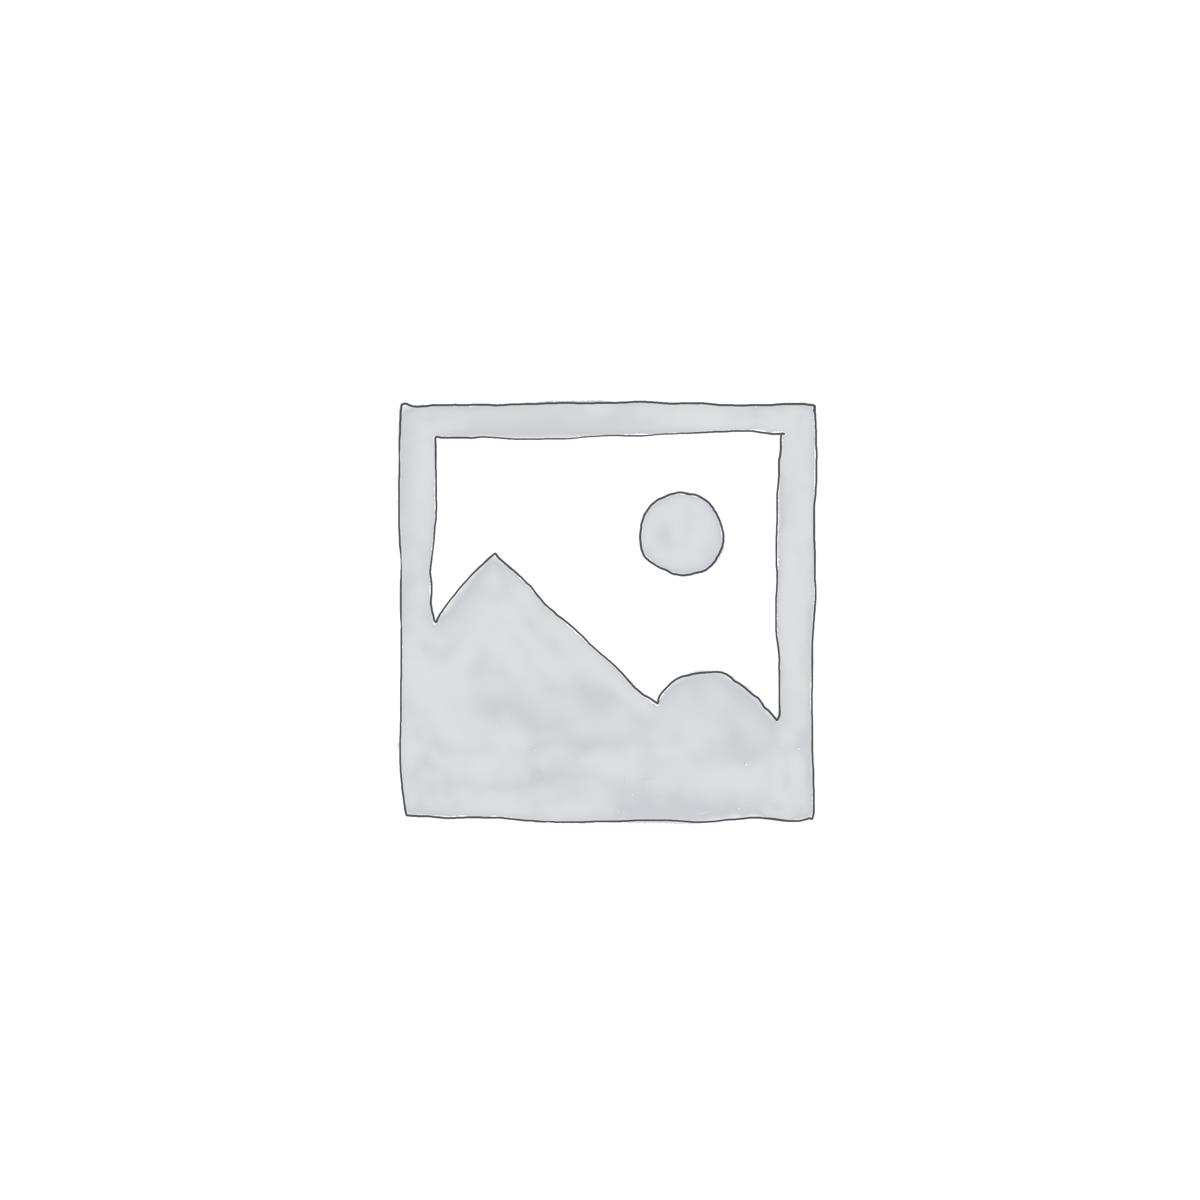 Nursery Lotus Leaf and Fish Wallpaper Mural